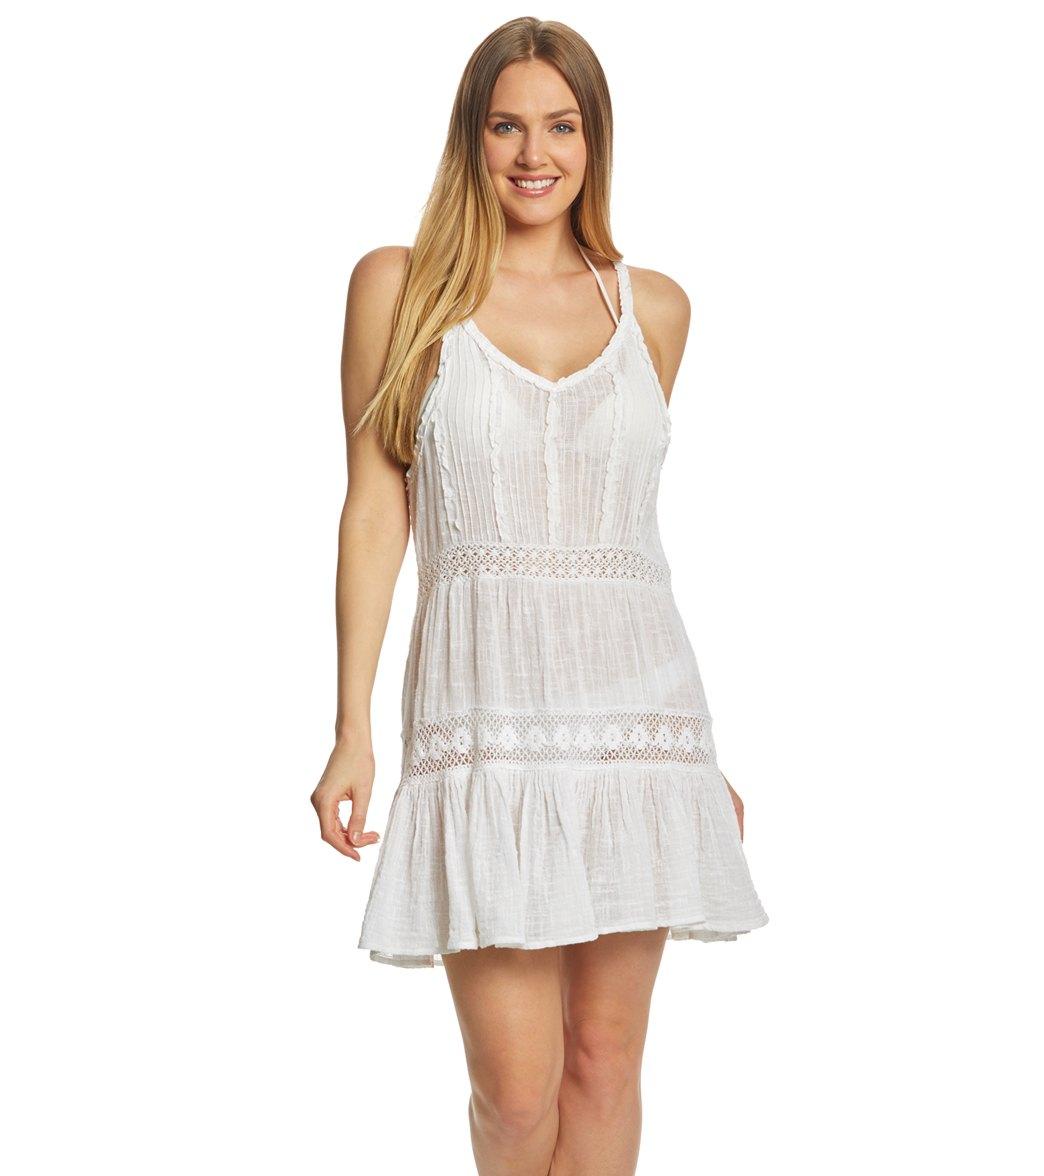 9a42bd2ebe Polo Ralph Lauren Cotton Slub Coverup Dress at SwimOutlet.com - Free  Shipping